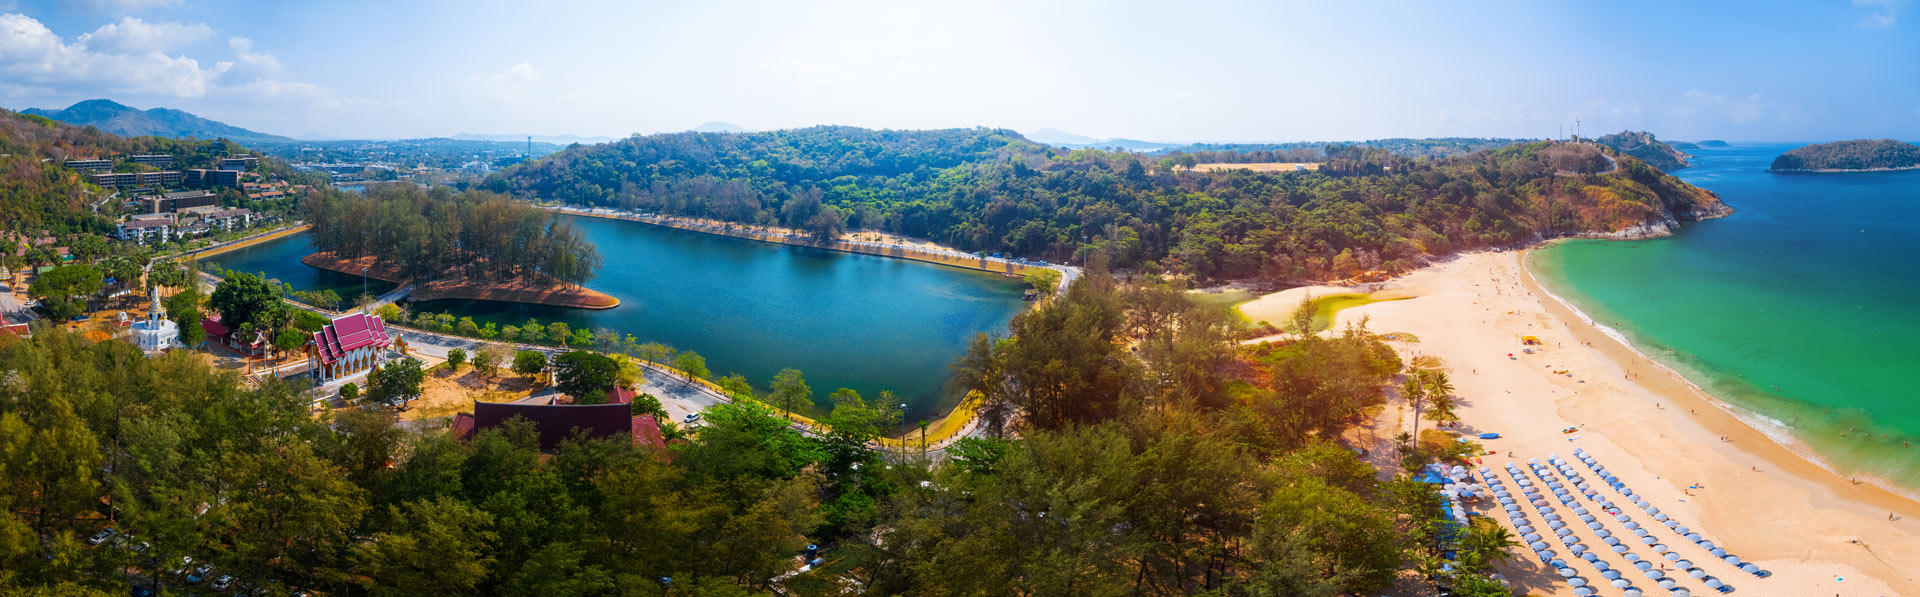 Nai Harn Lake, Fitness Park, Ayurveda, Wellness, Yoga Retreats, Phuket Thailand, Mangosteen Ayurveda & Wellness Resort, Number 1 Ayurveda Resort in Thailand, Rawai, Phuket.